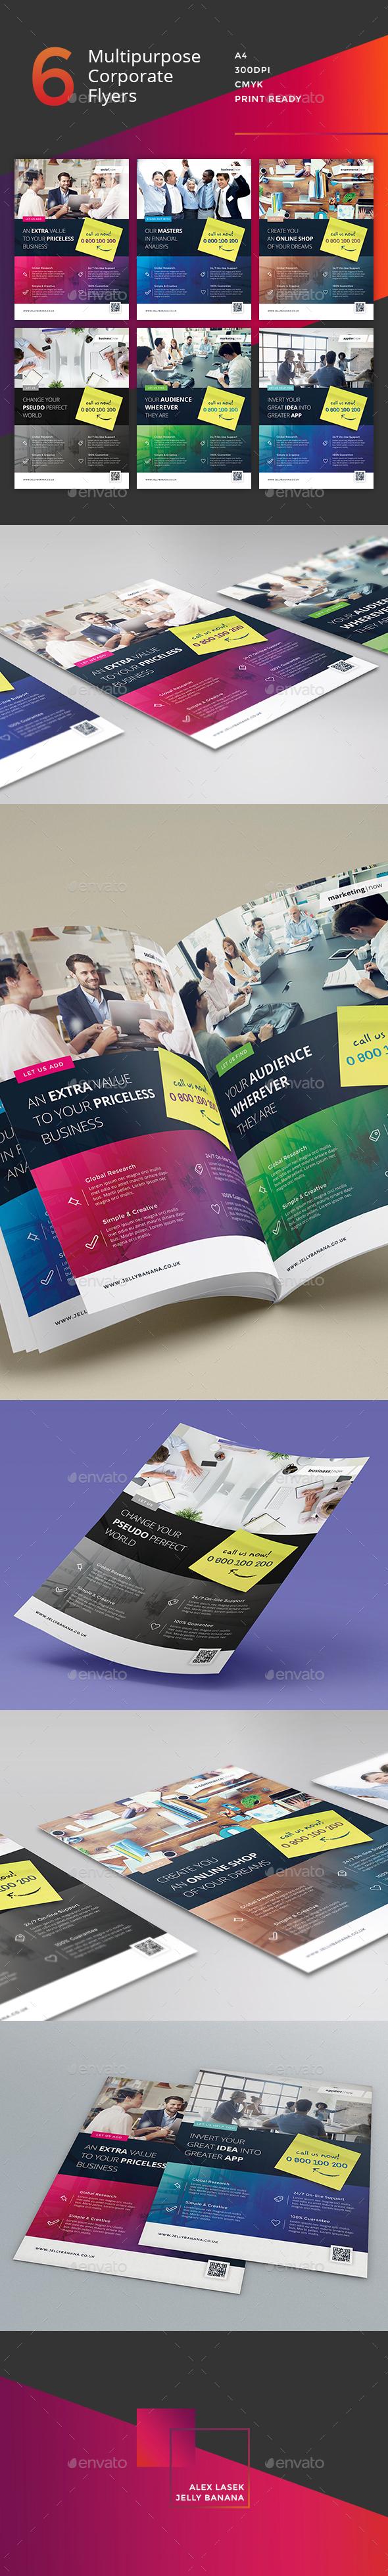 Corporate Flyer - 6 Multipurpose Business Templates vol 23 - Corporate Flyers